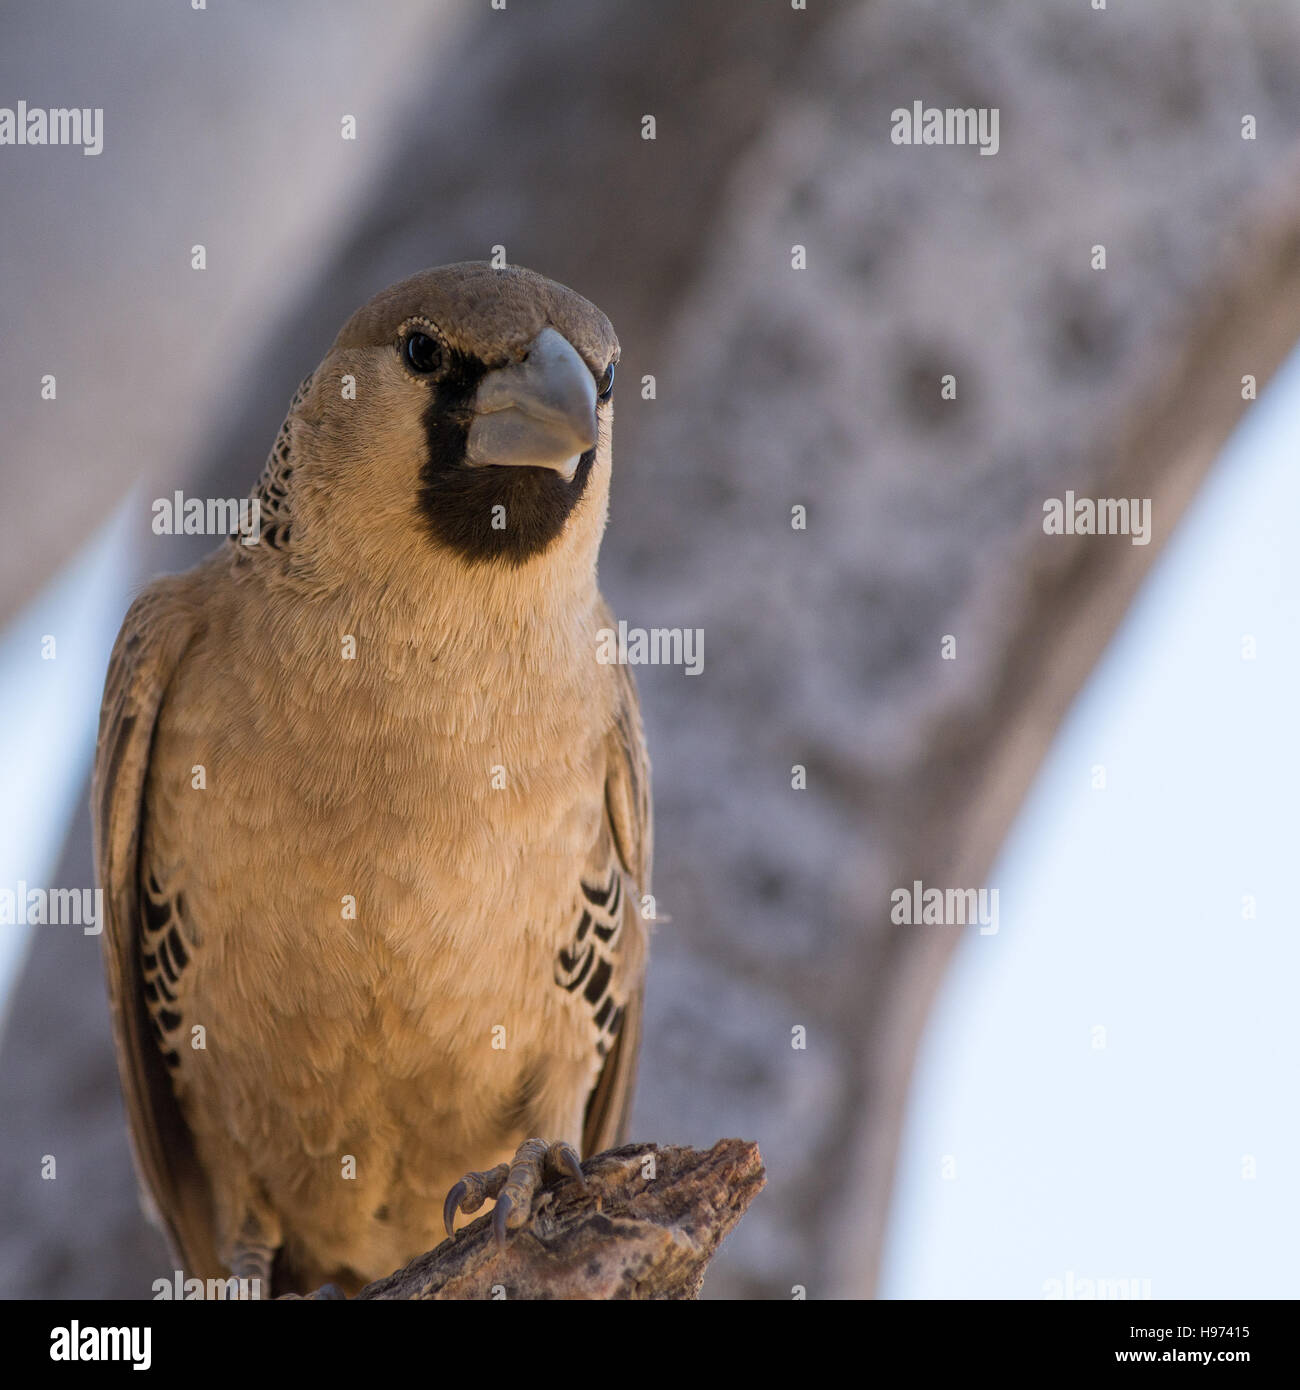 Female Weaver Bird, seen in namibia, africa. - Stock Image